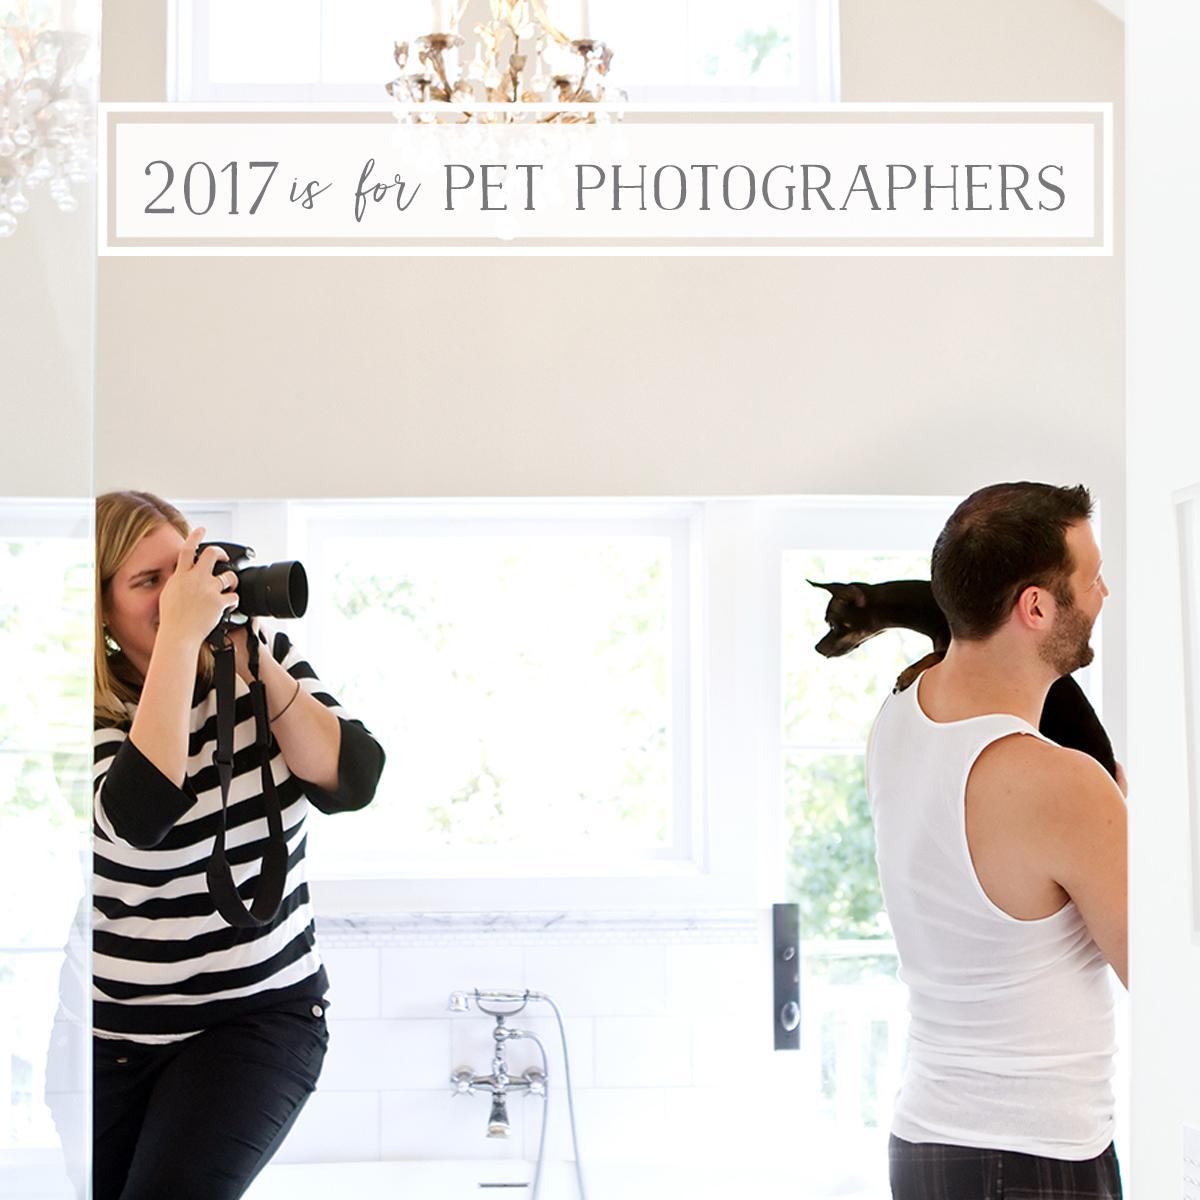 Pet Photography Profit Primer retreat in 2017